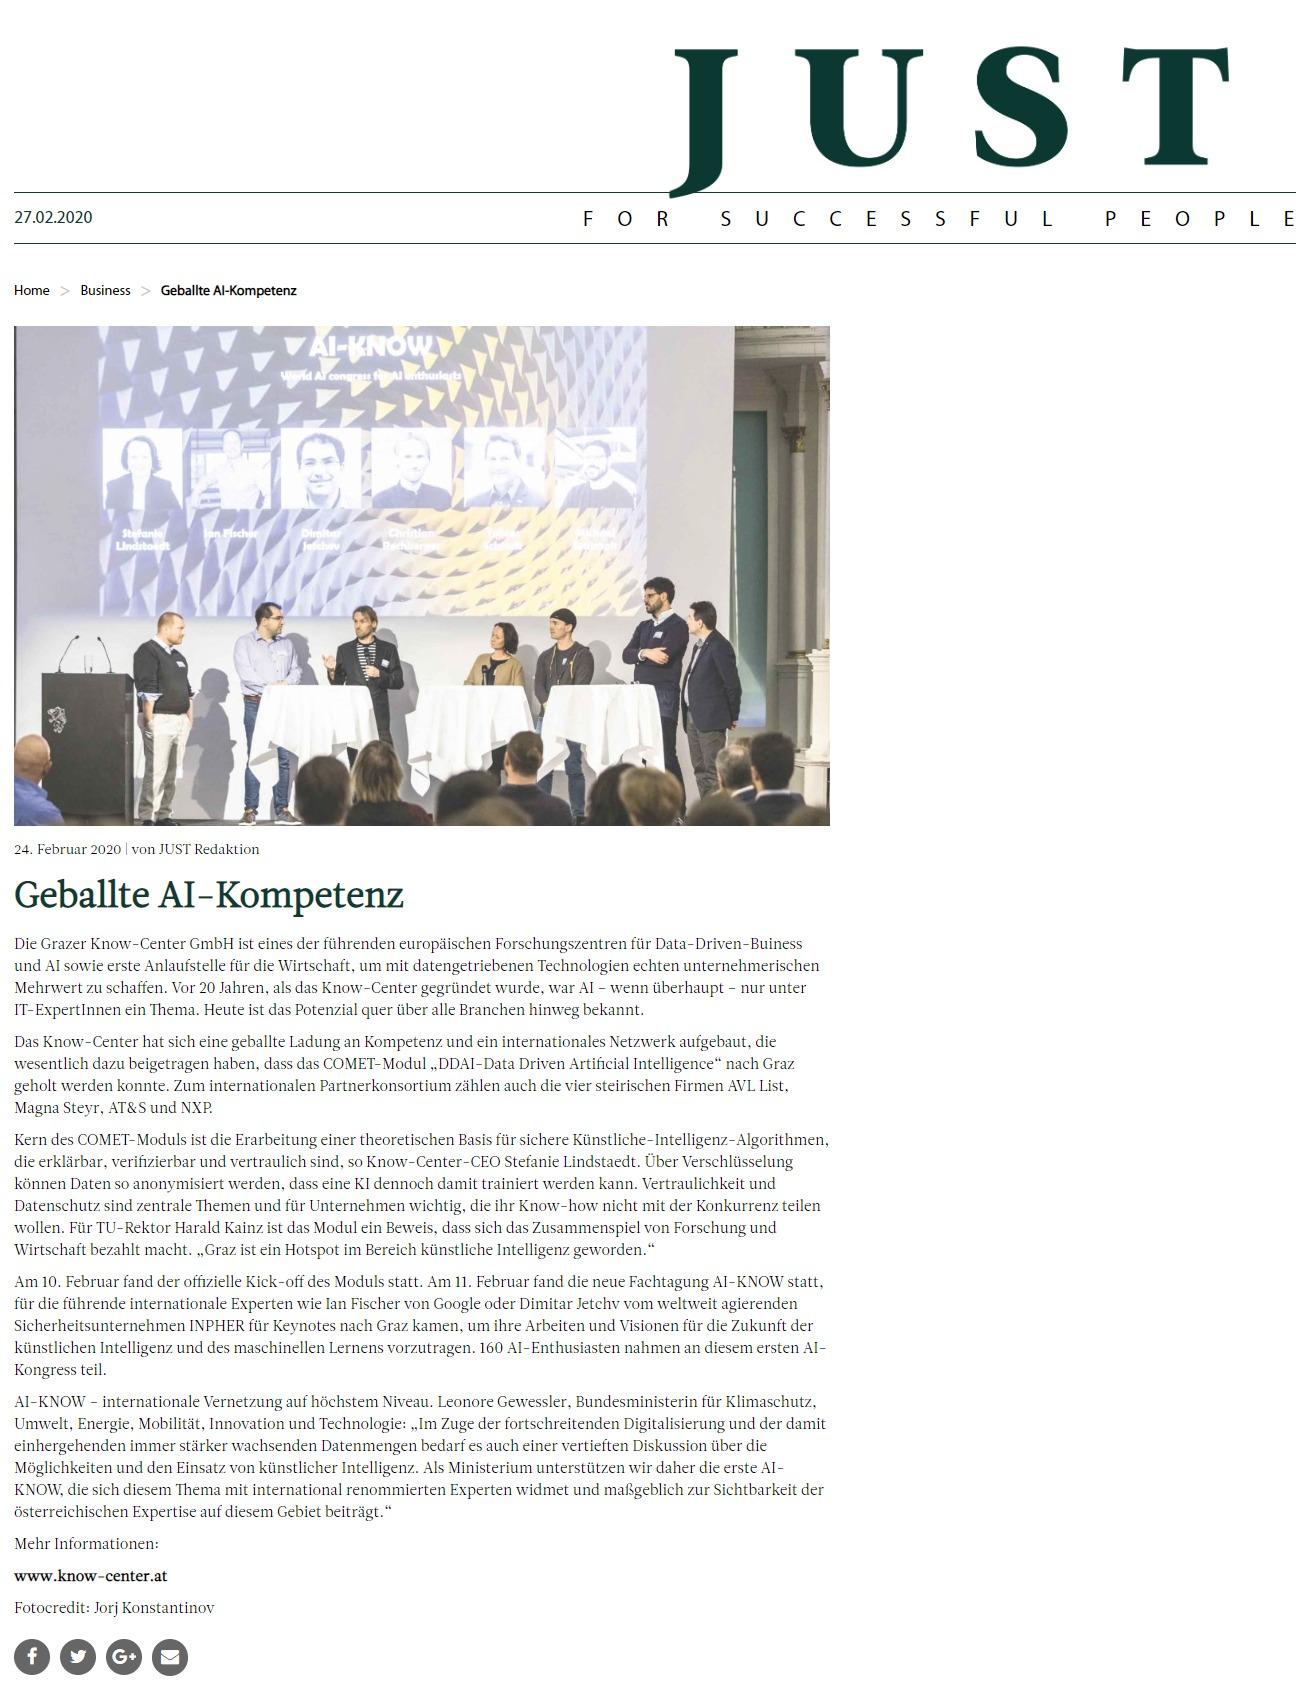 2020-02-24__JUST-magazin.com_Geballte AI-Kompetenz